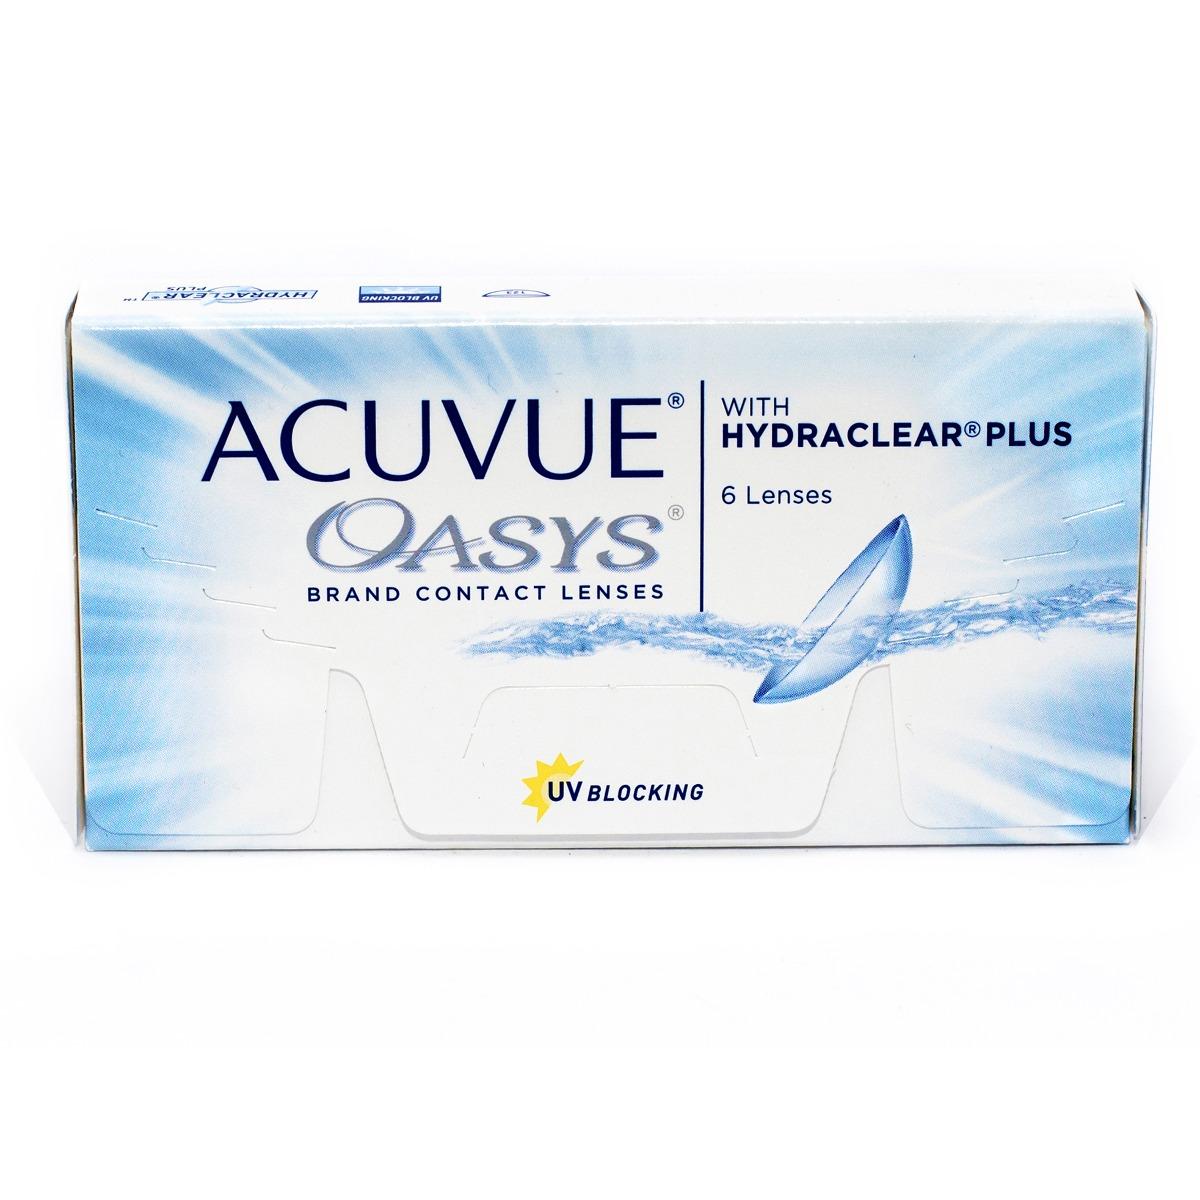 Lentes De Contato Acuvue Oasys Com Hydraclear Plus Grau-1.75 - R ... 4e024073f3